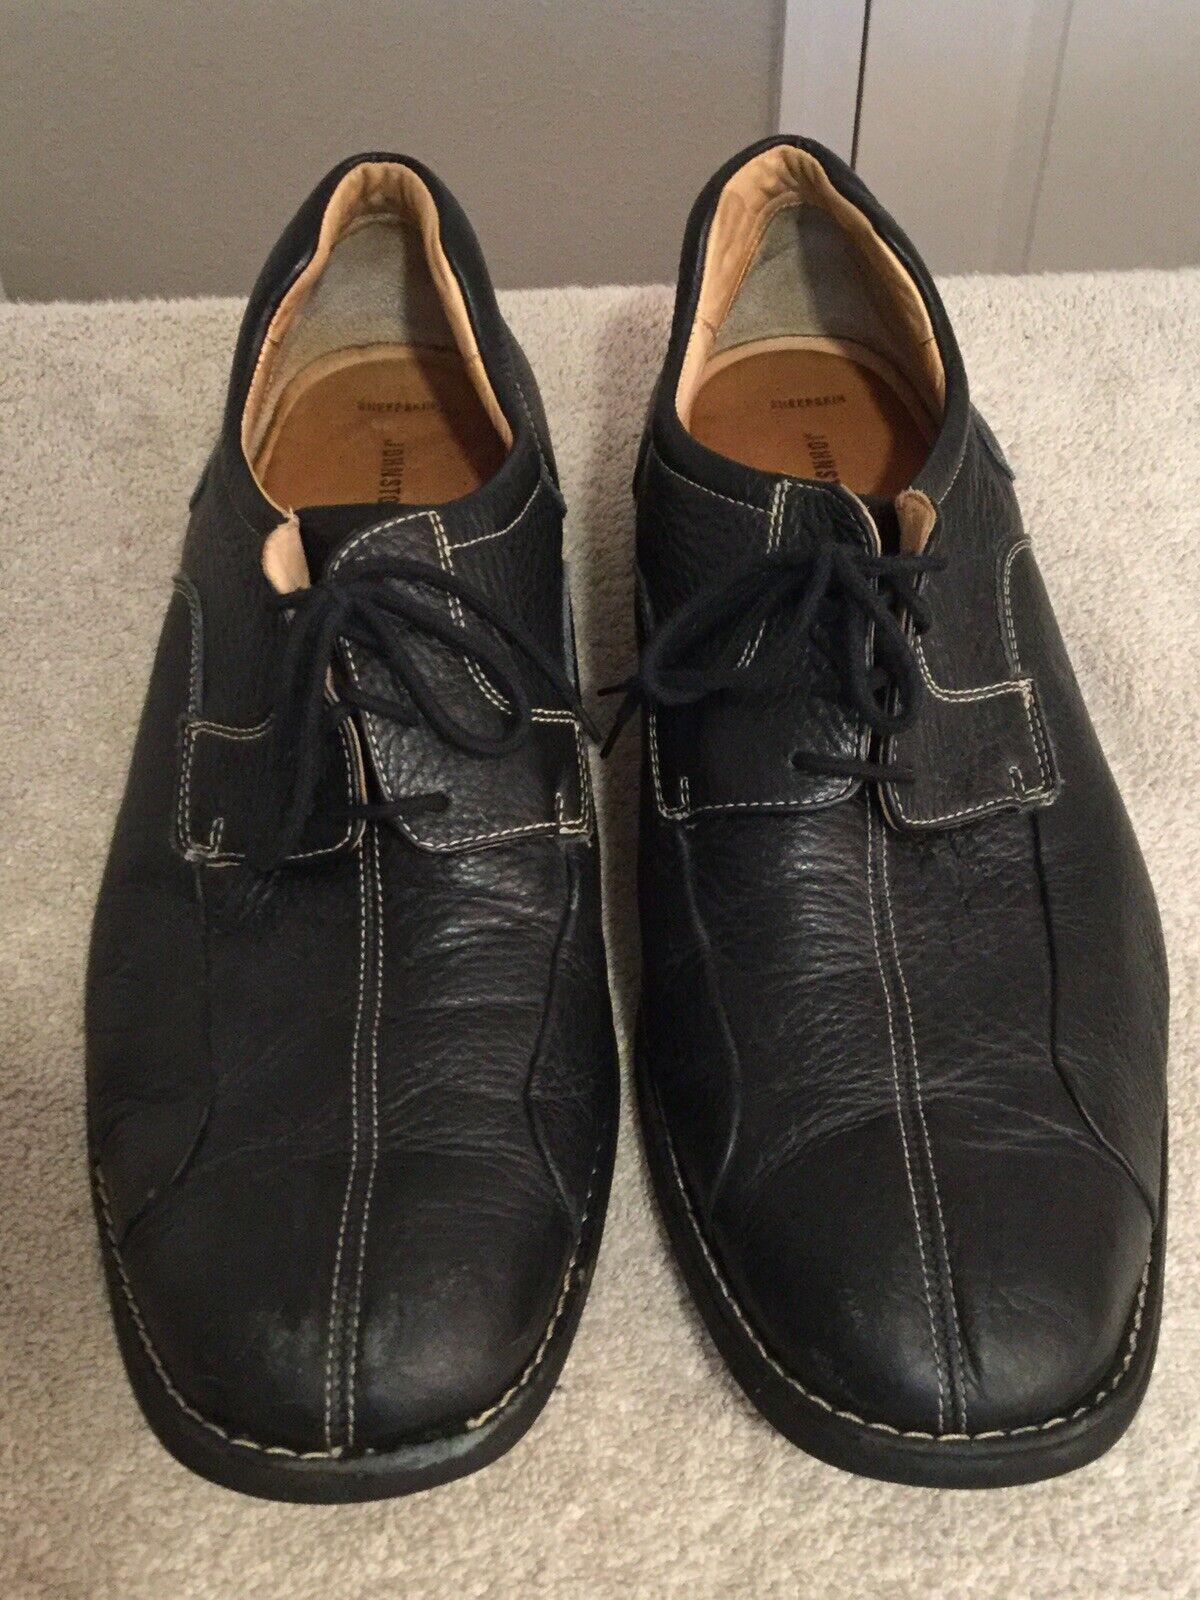 JOHNSTON & MURPHY Black Oxford Casual Shoes. Size 16M. Excellent Condition.